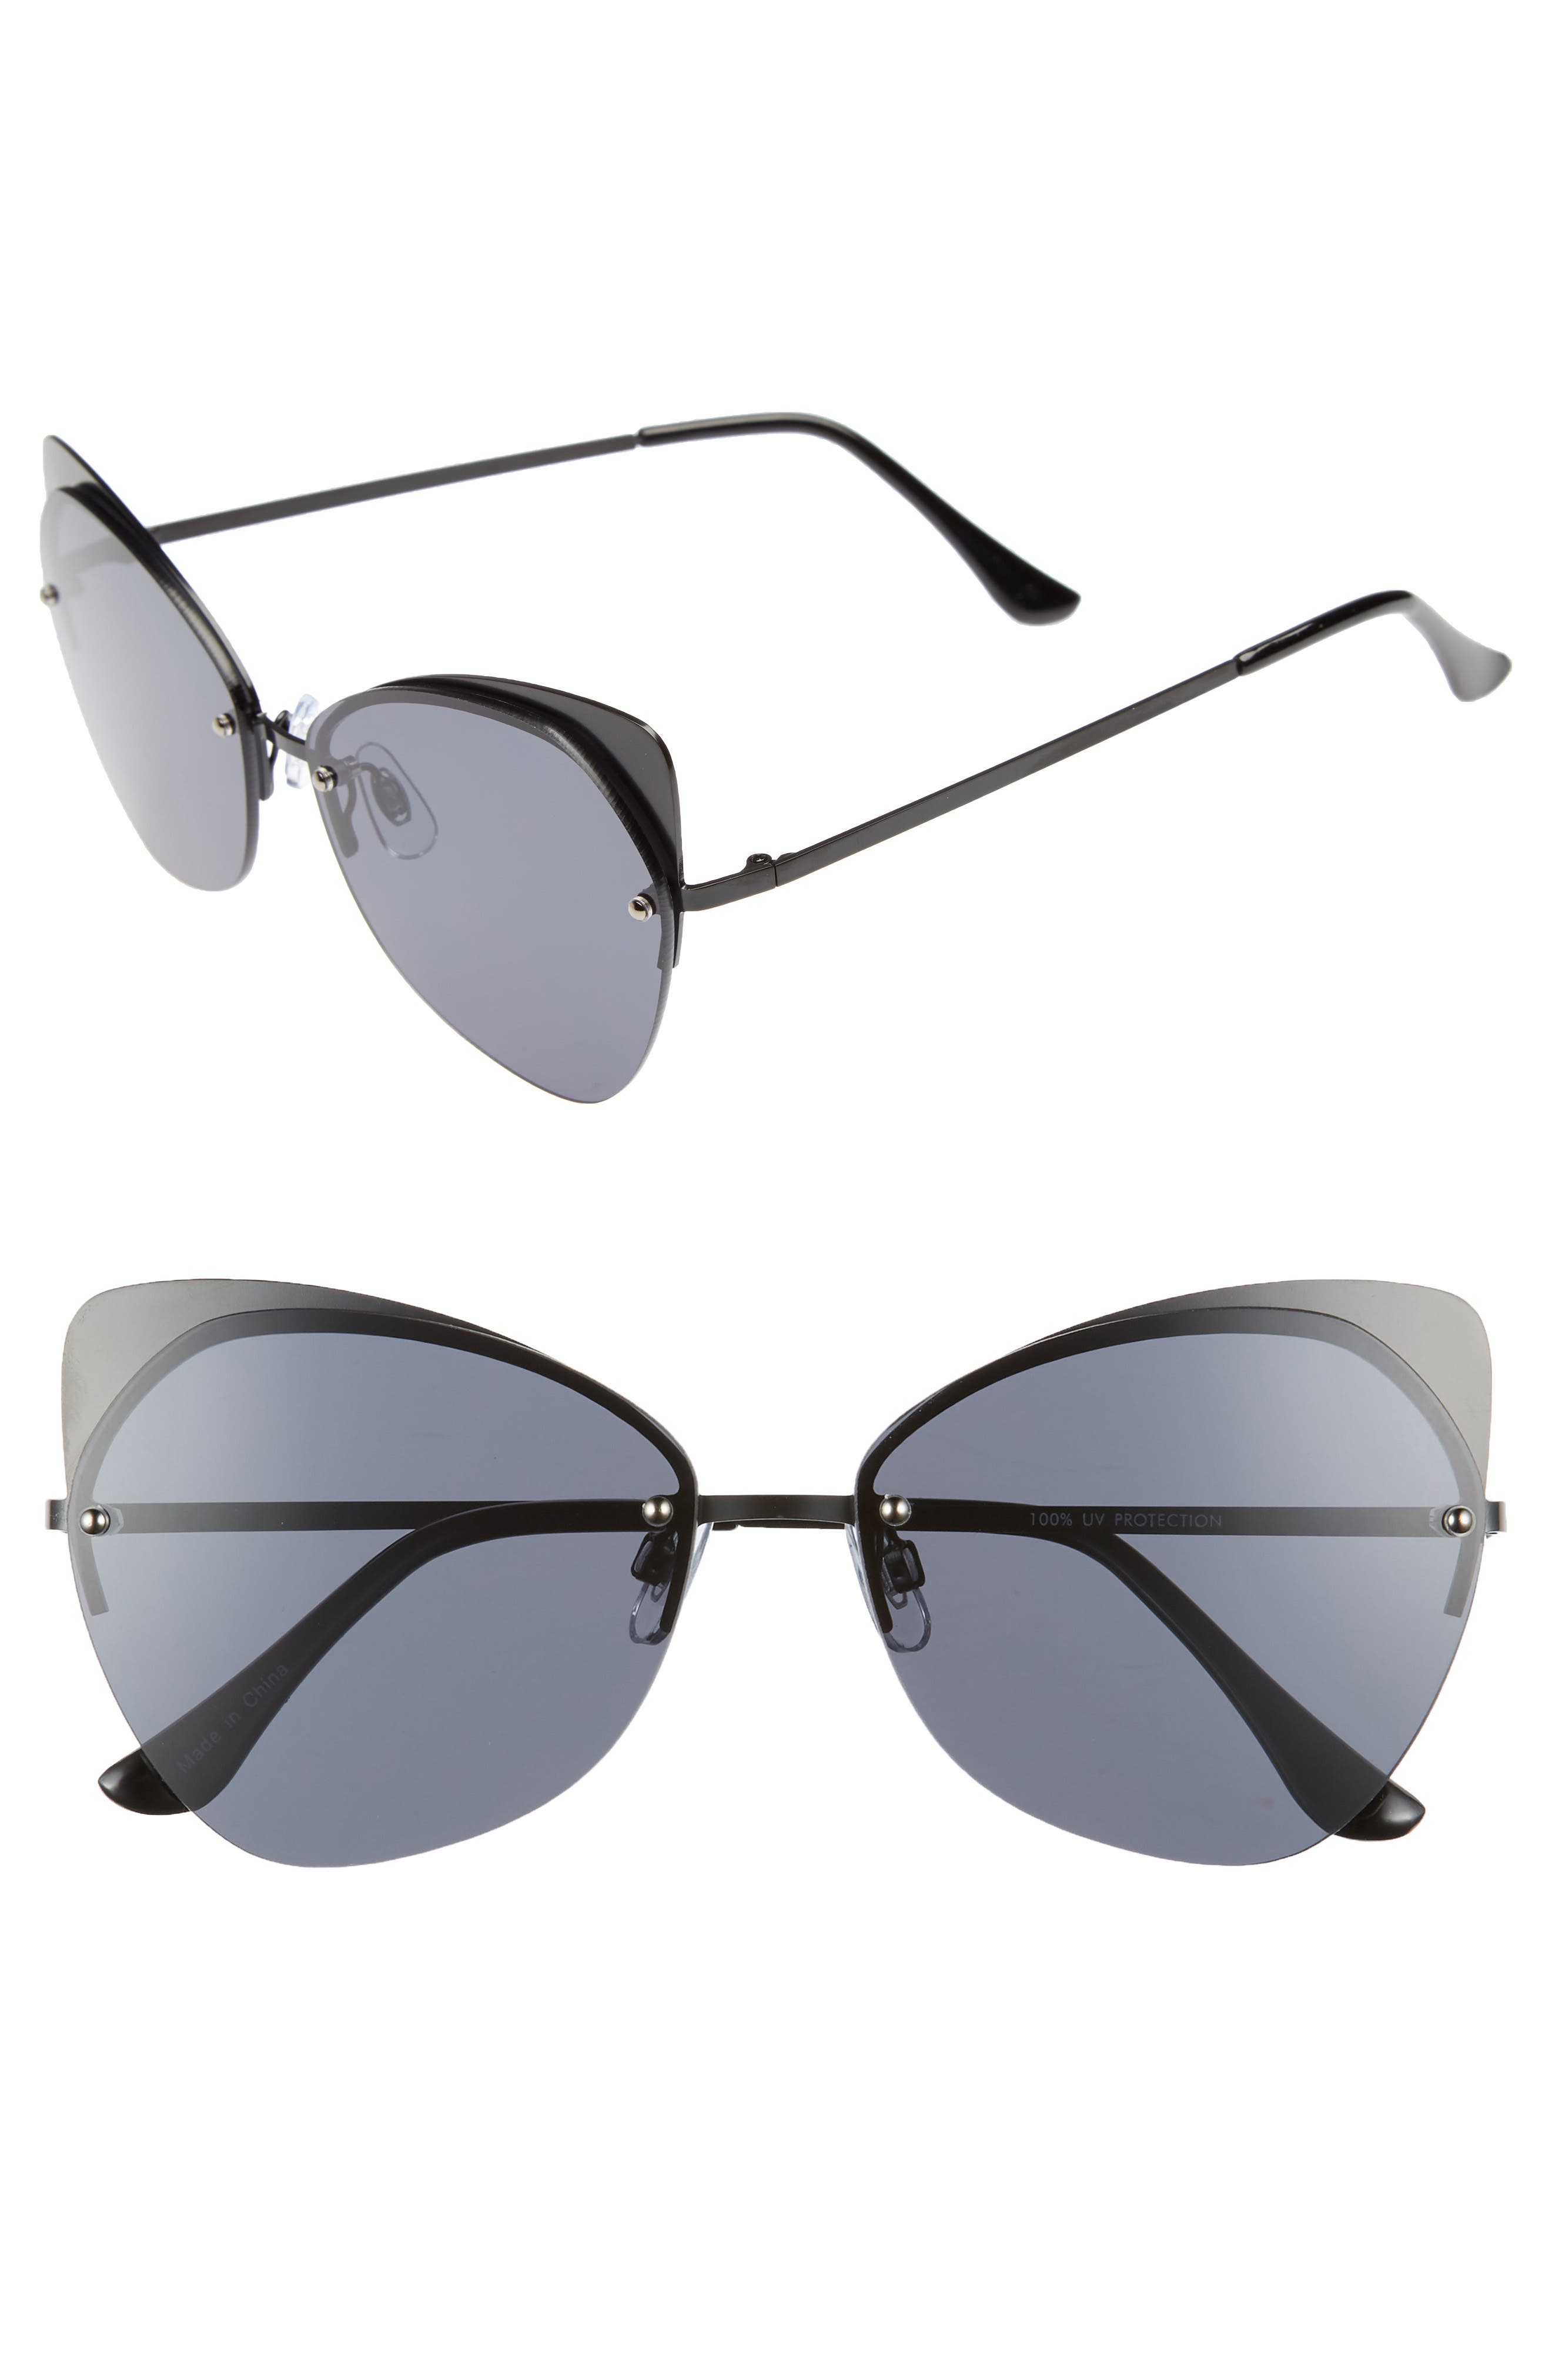 59mm Rimless Cat Eye Sunglasses,                             Main thumbnail 1, color,                             001